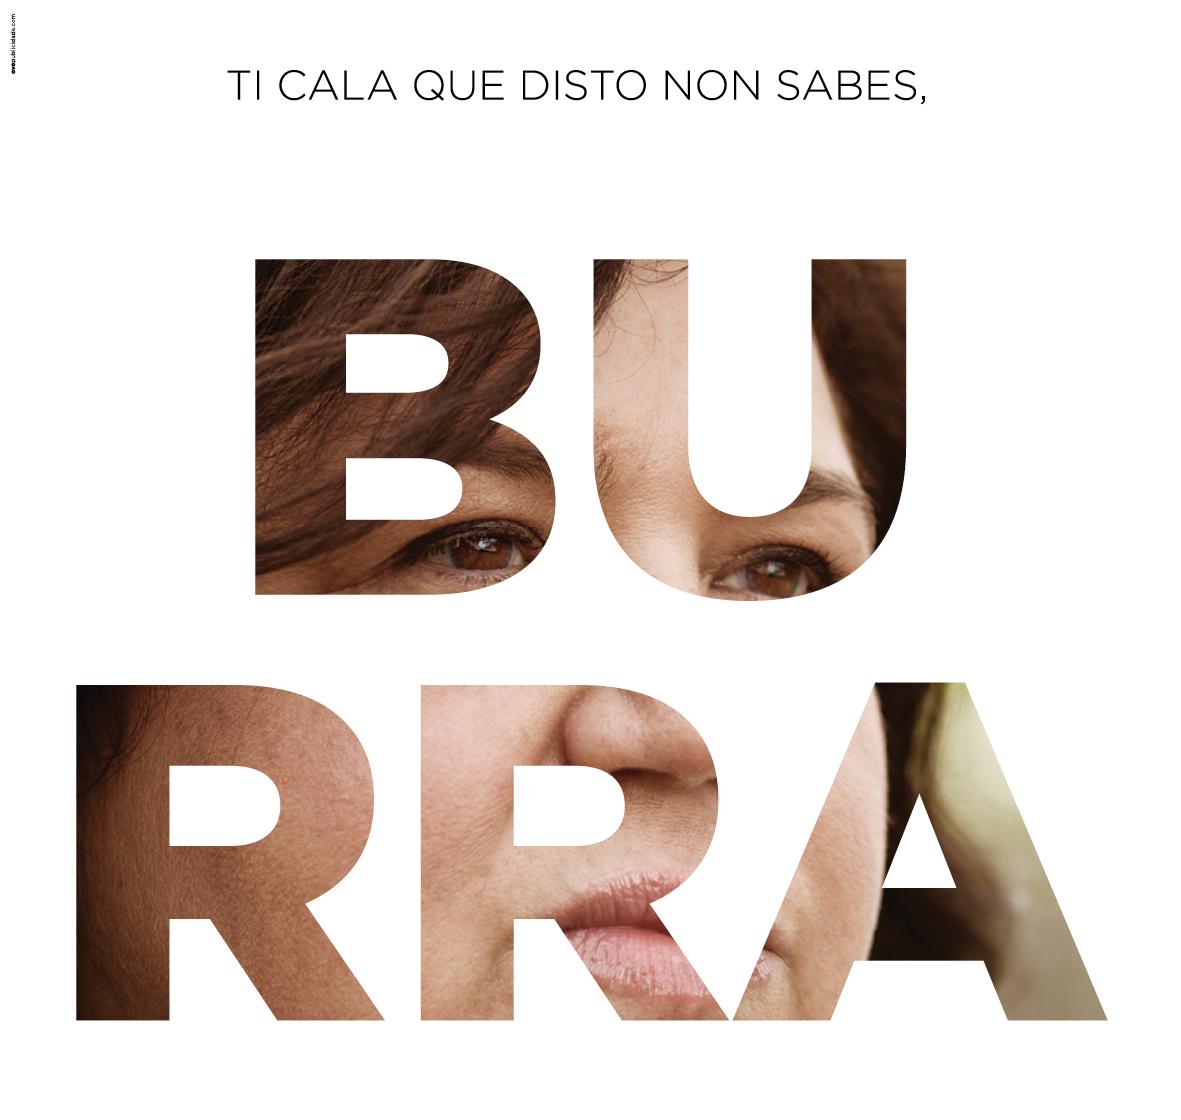 Puta-Burra-Cerda-Campanha-Violencia-Genero_Pontevedra-2_Blog-the-orange-market